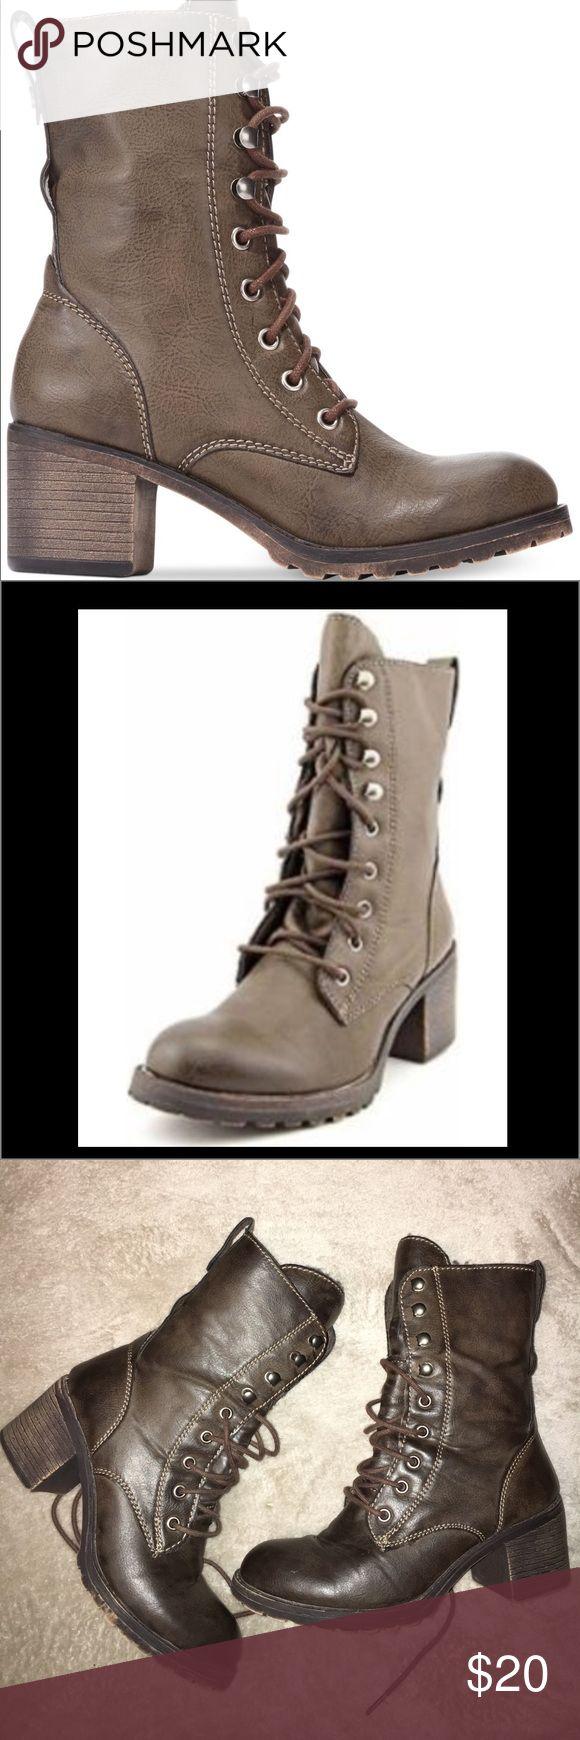 American rag zack moto combat boots 7W American rag combat boots with a heel size 7 W American Rag Shoes Combat & Moto Boots